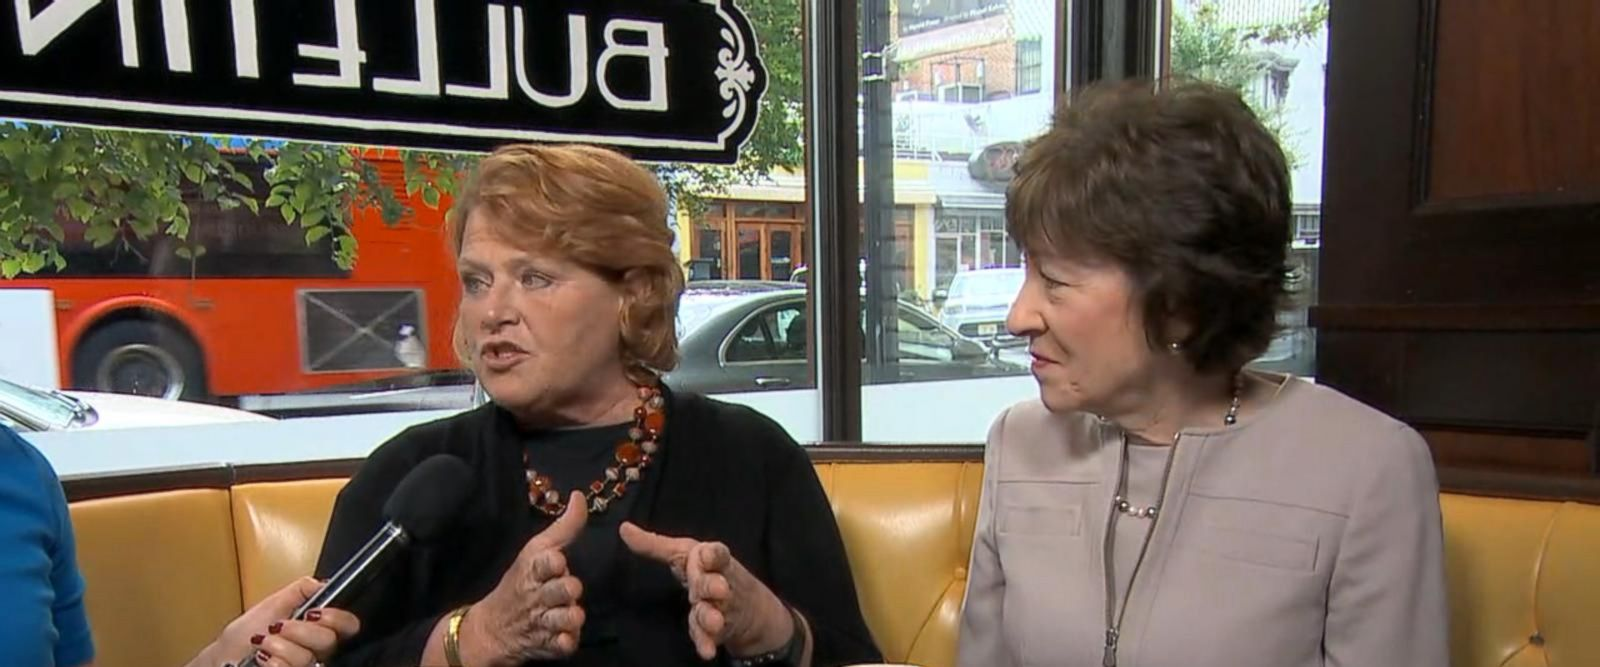 VIDEO: Senators Susan Collins and Heidi Heitkamp talk bipartisanship